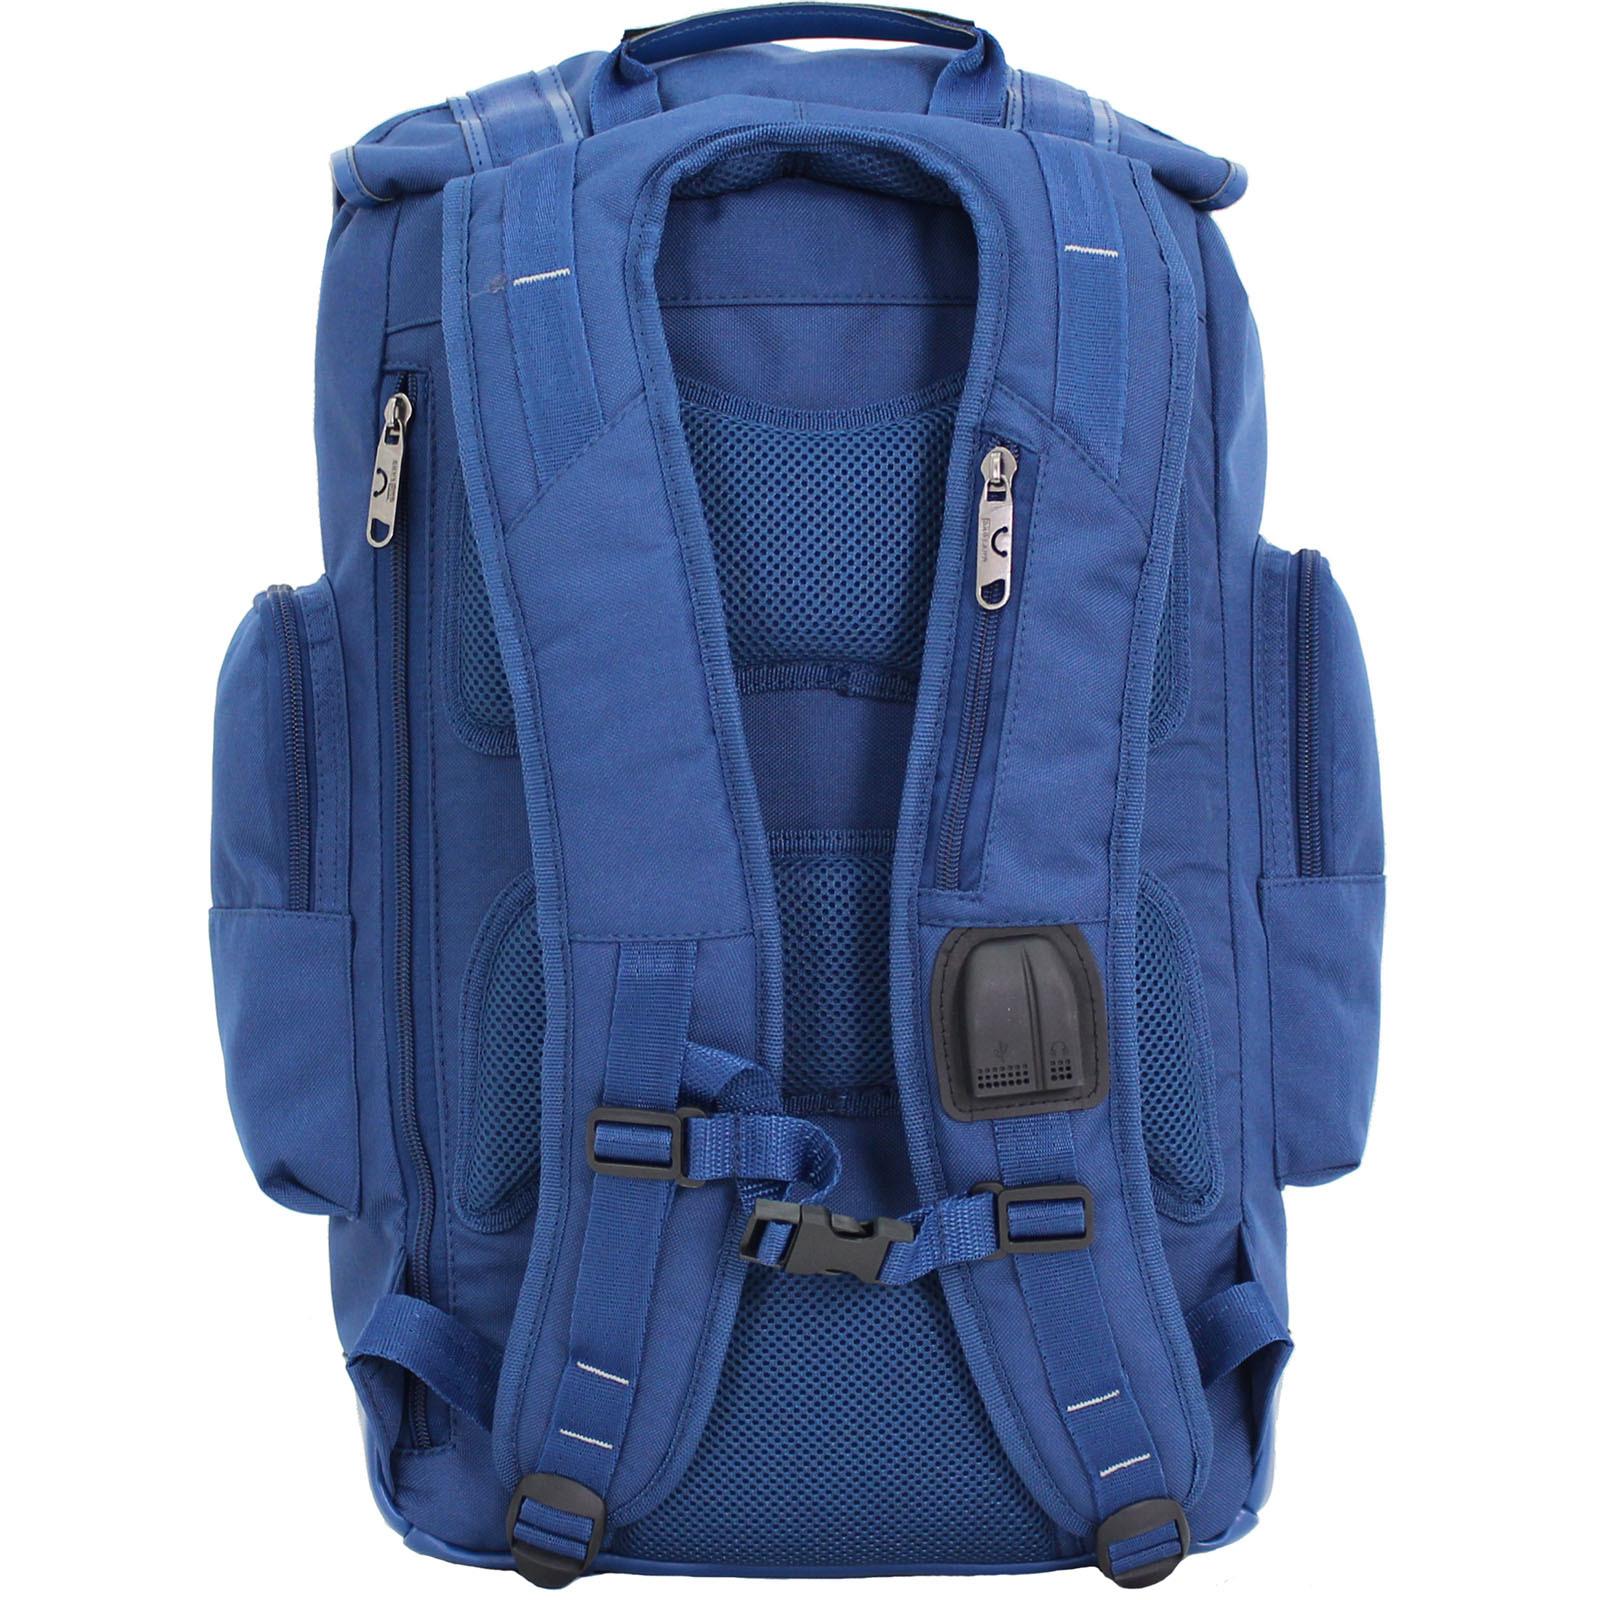 Рюкзак для ноутбука Bagland Palermo 25 л. Синий (0017966) фото 3